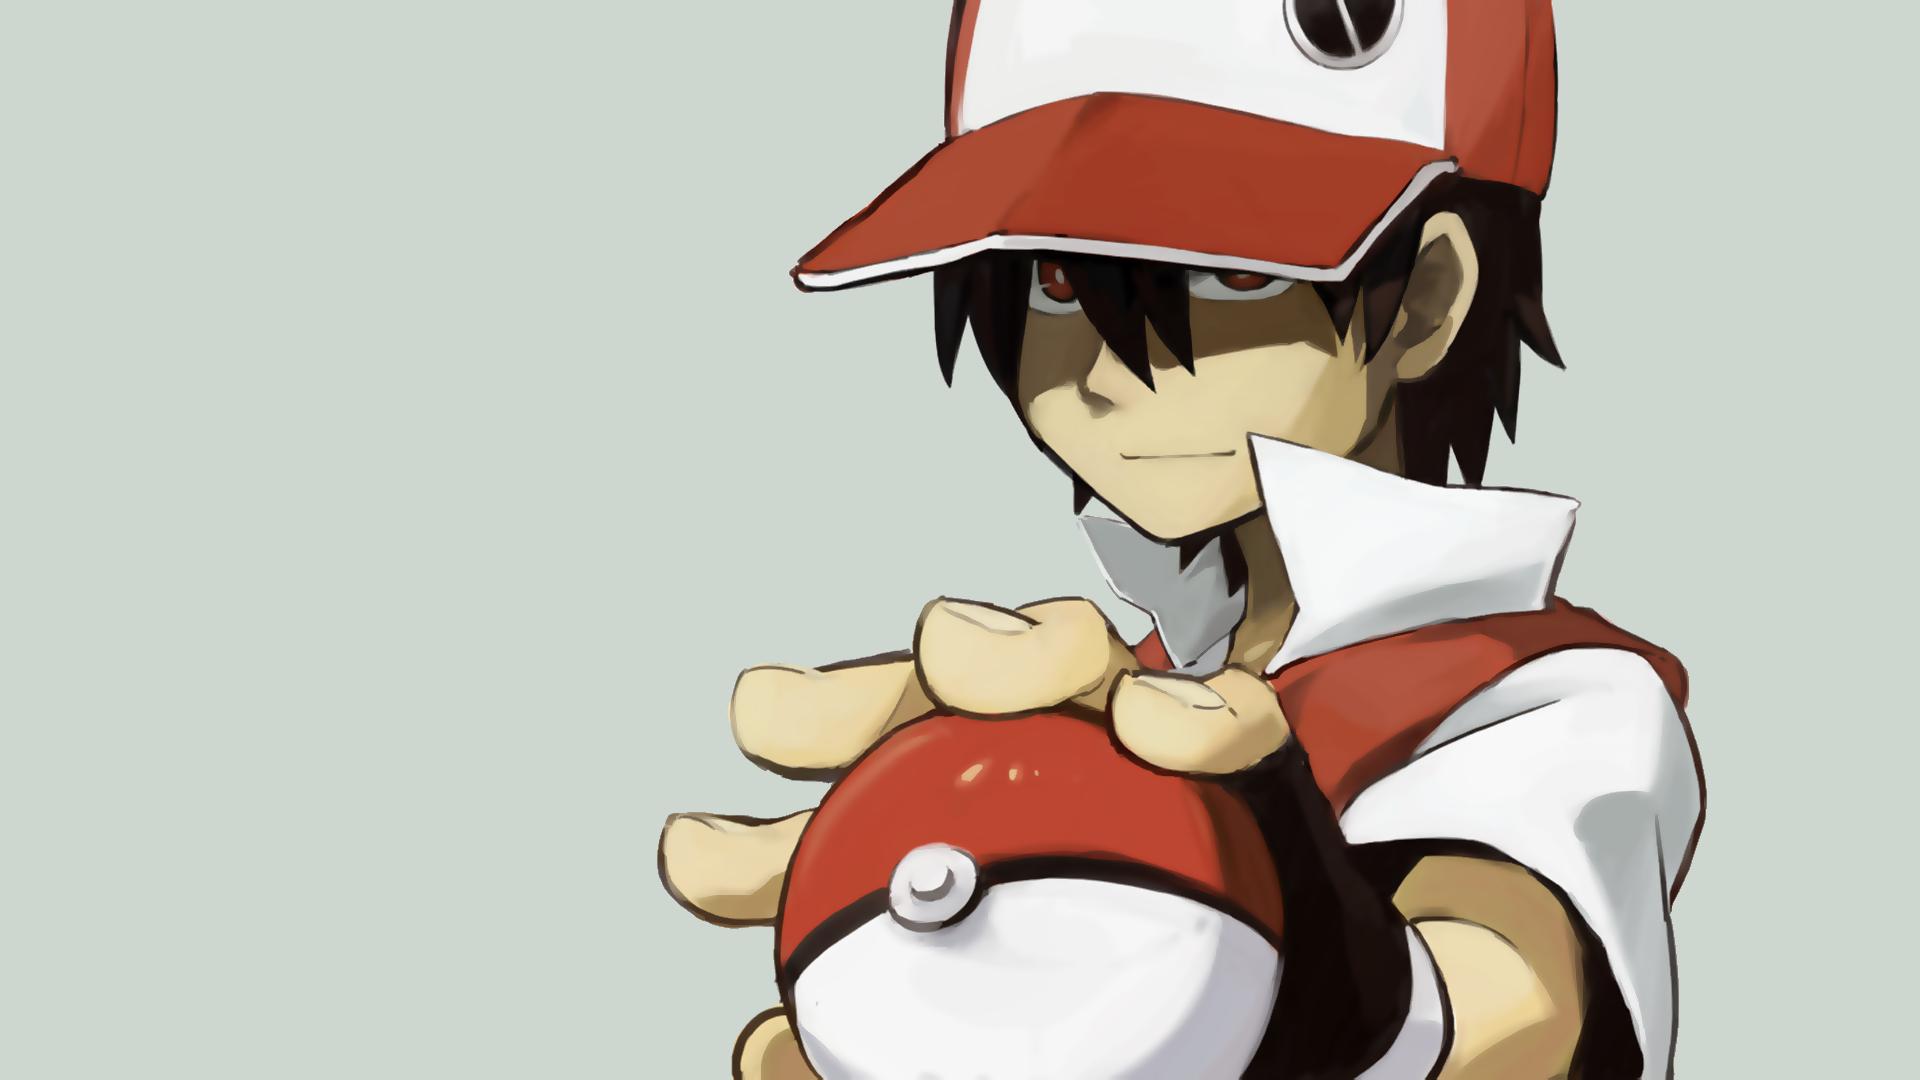 77 Pokemon Trainer Red Wallpaper On Wallpapersafari